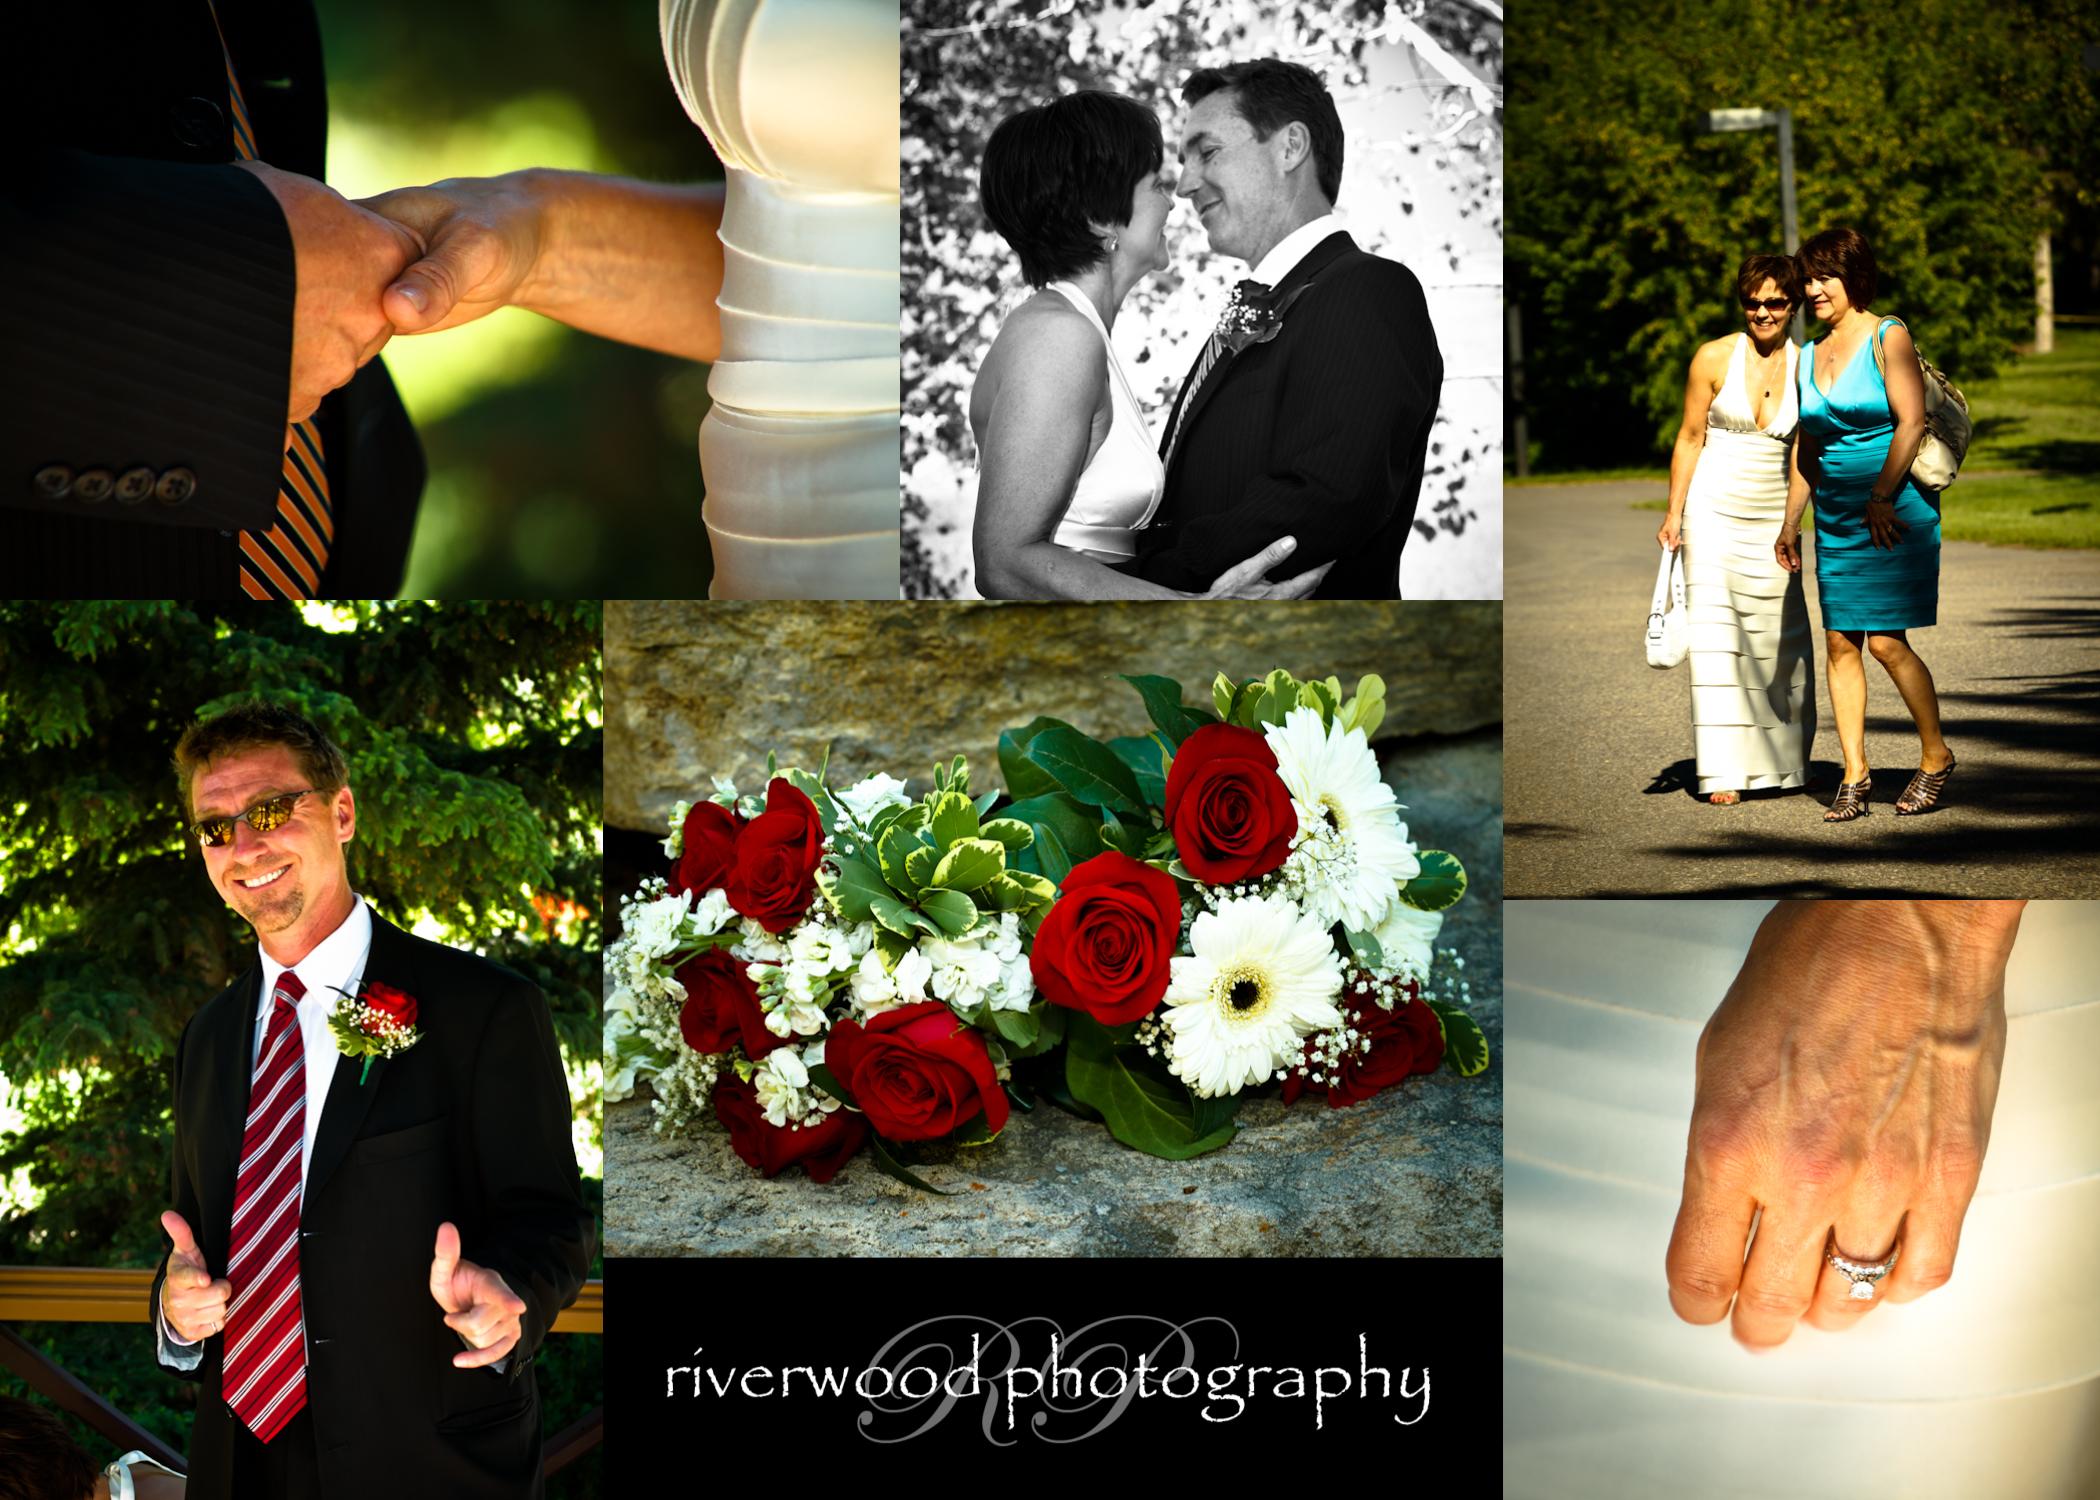 Shar & Dwayne Wedding June 13, 2010 | Calgary Wedding Photographer